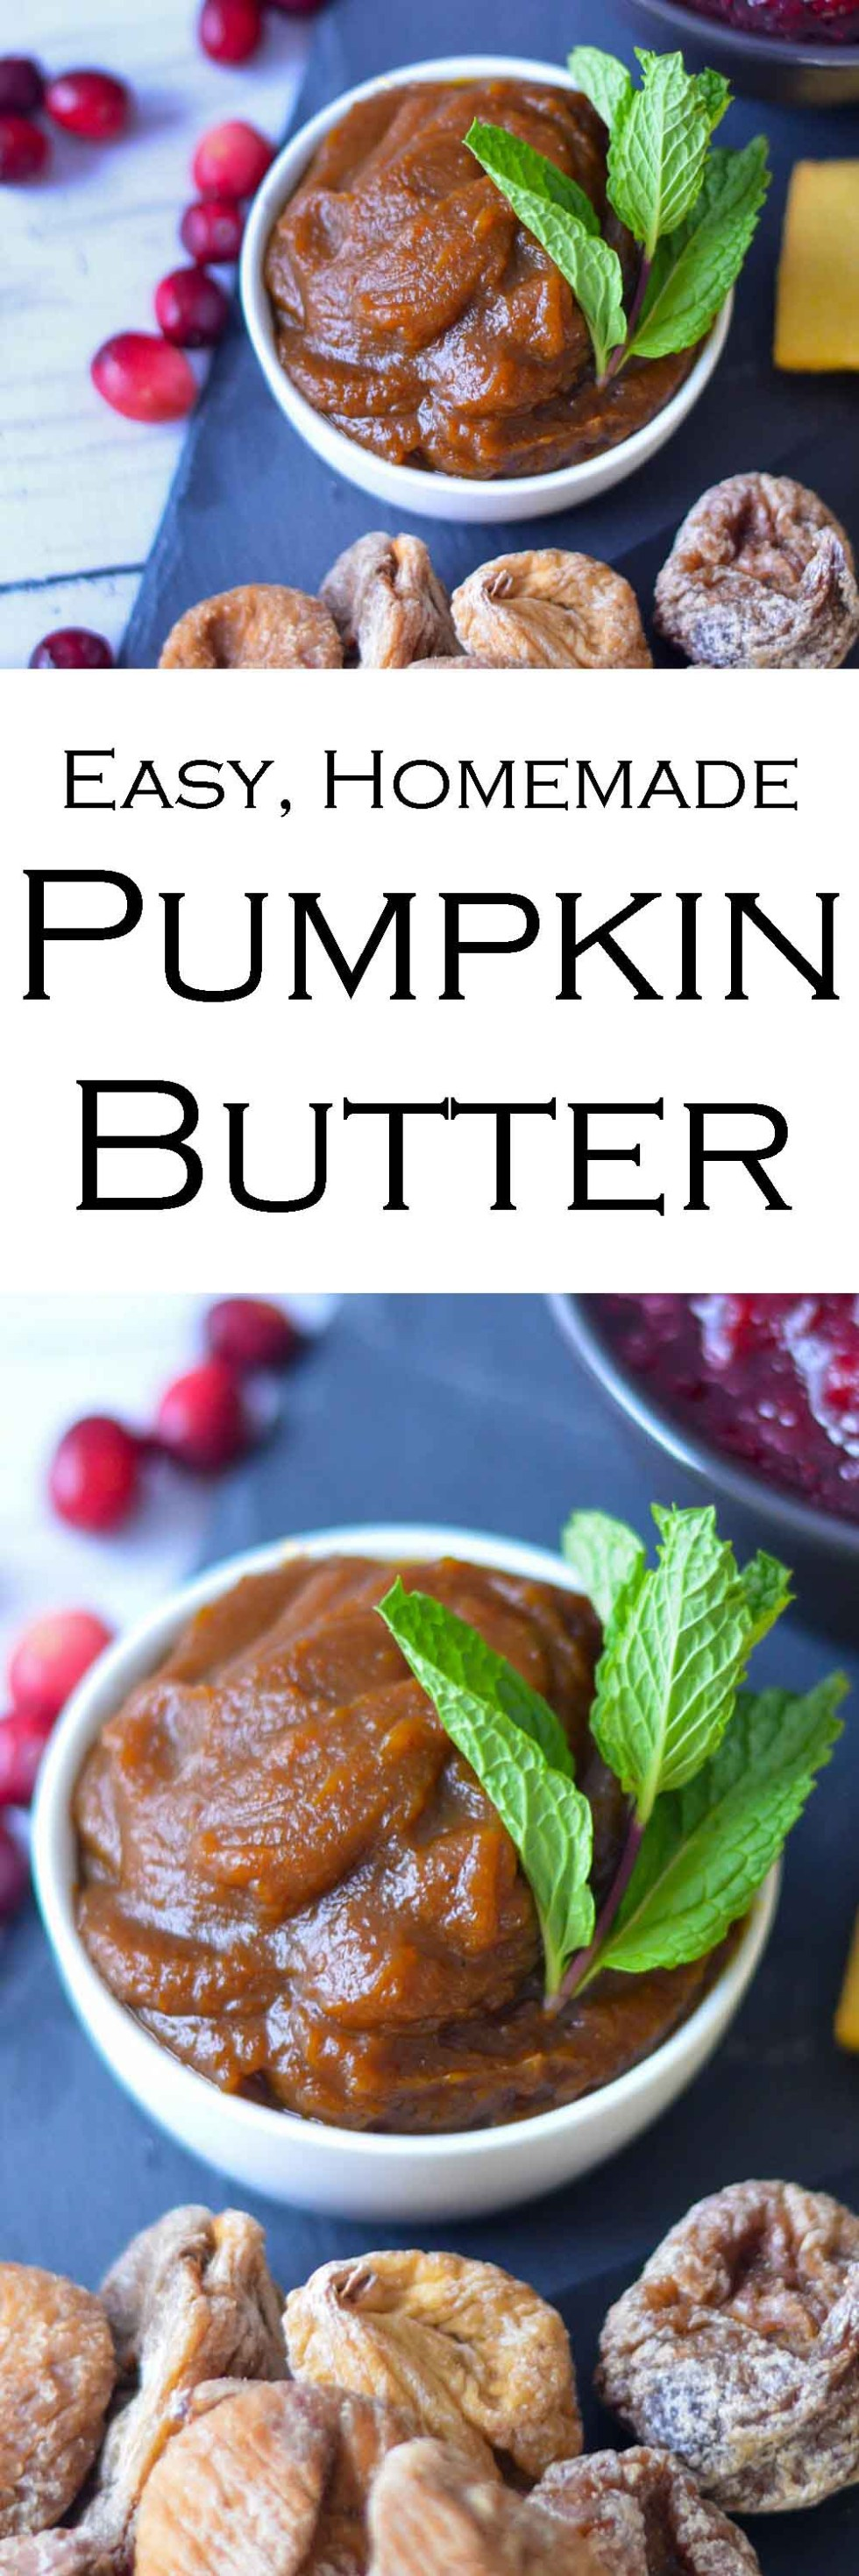 Easy Pumpkin Butter Recipe #LMrecipes #pumpkin #thanksgiving #christmas #holidayparty #holidaypartyfood #traderjoes #pumpkin #appetizers #homesteading #foodblog #foodblogger